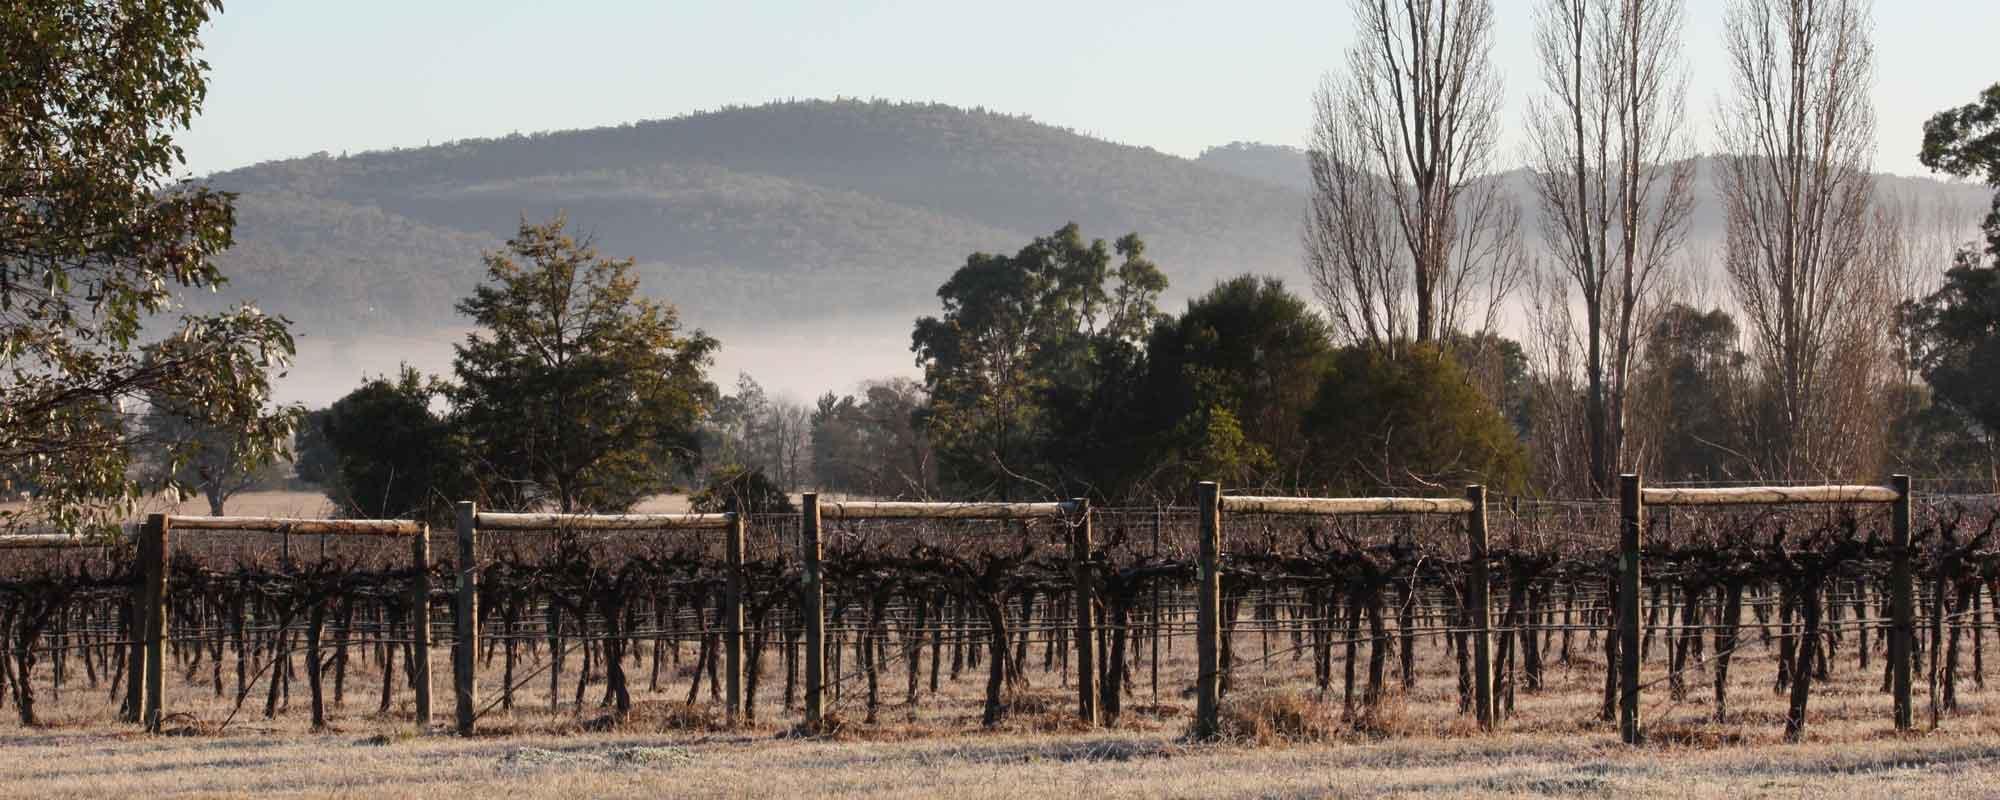 vineyard view frosty